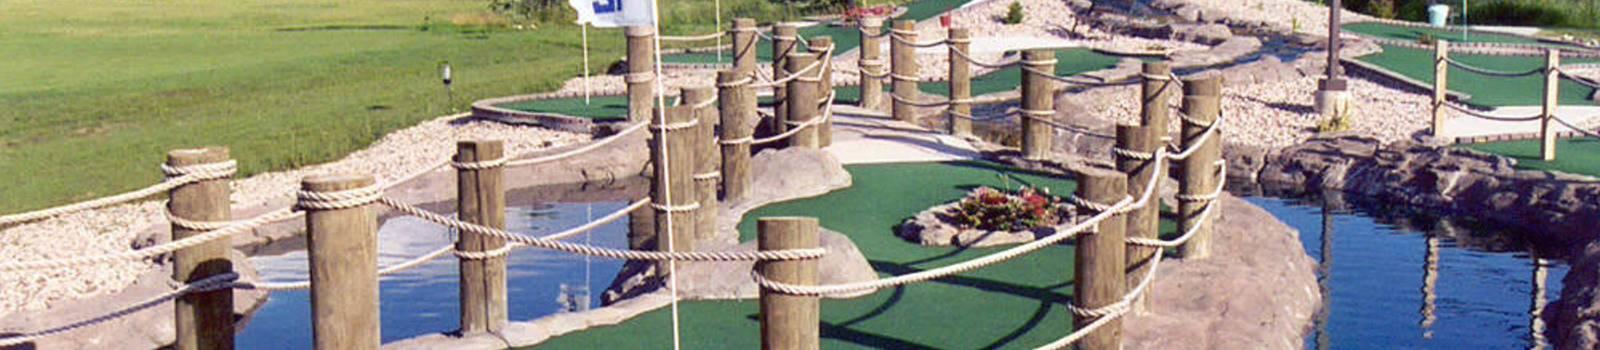 hole 18 mini golf course design